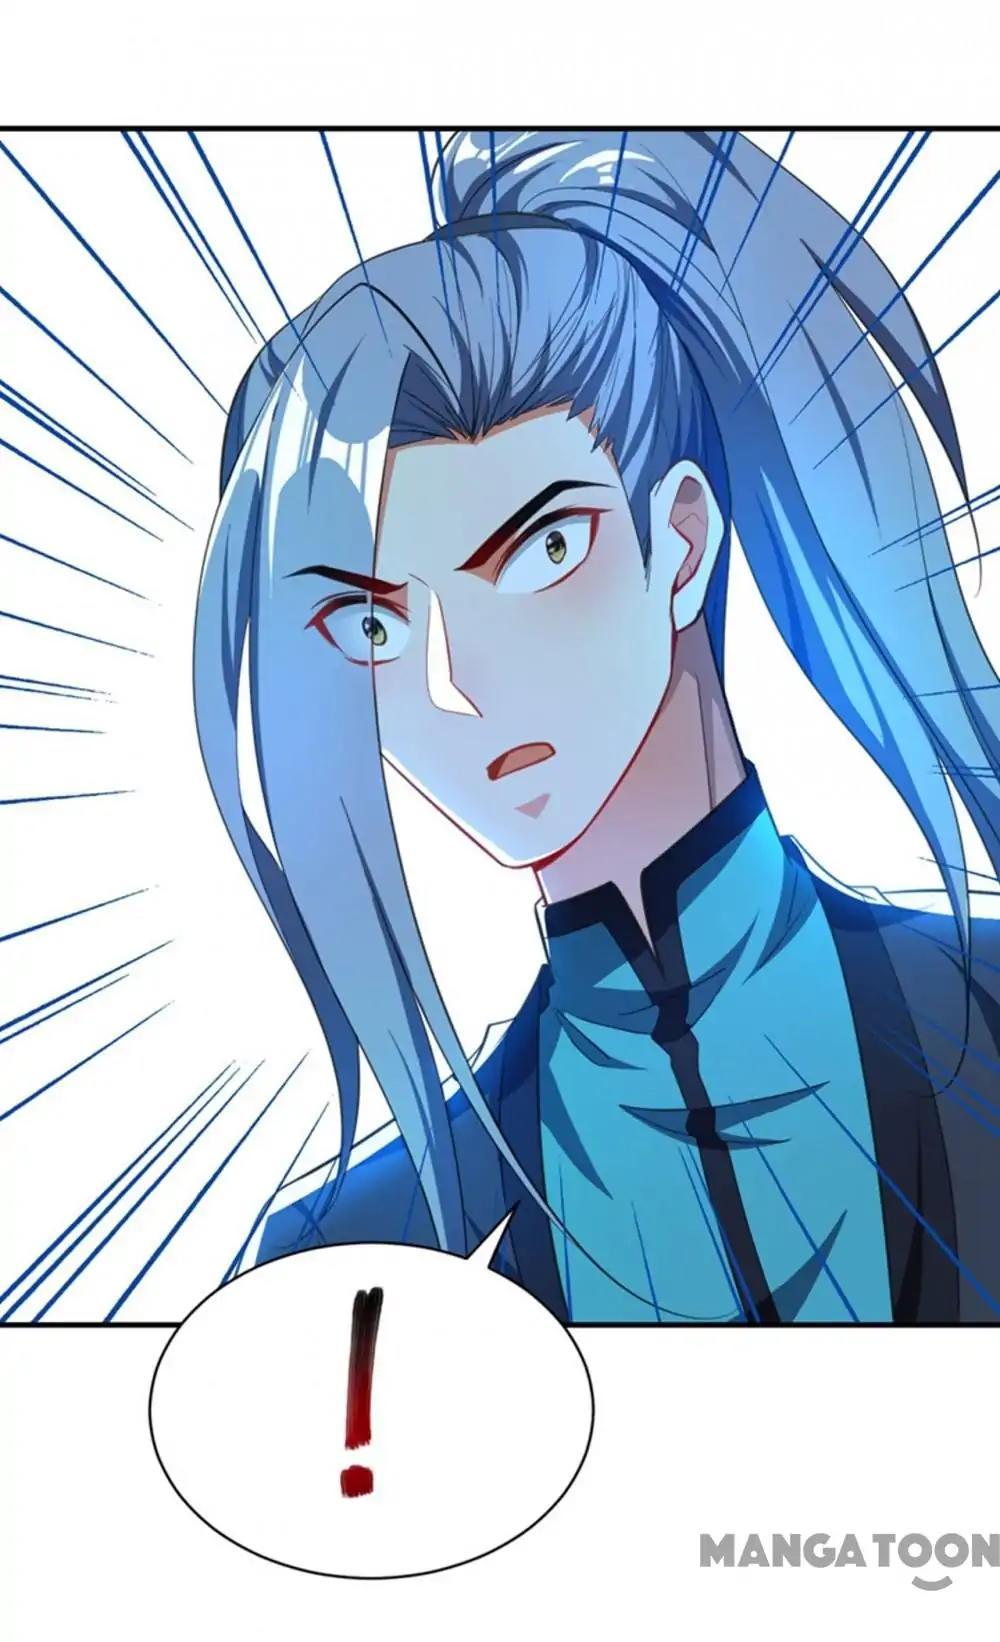 https://manga.mangadogs.com/comics/pic2/41/24169/1132800/7b4bdc3a82282ed018028c06f93de168.jpg Page 1